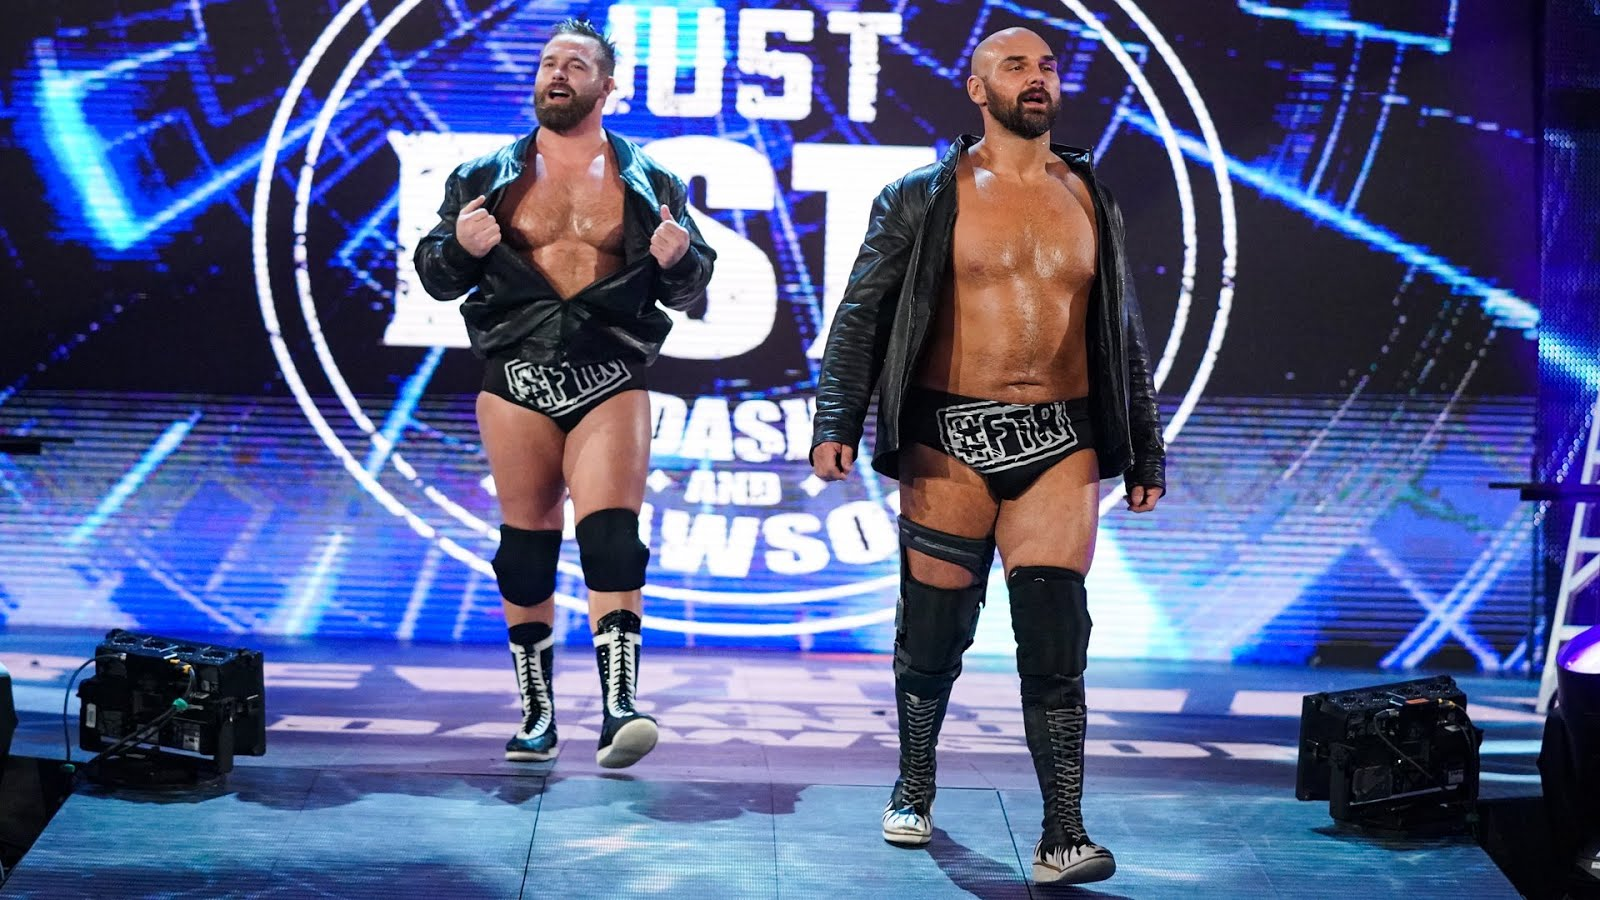 The Revival podem parar na NWA